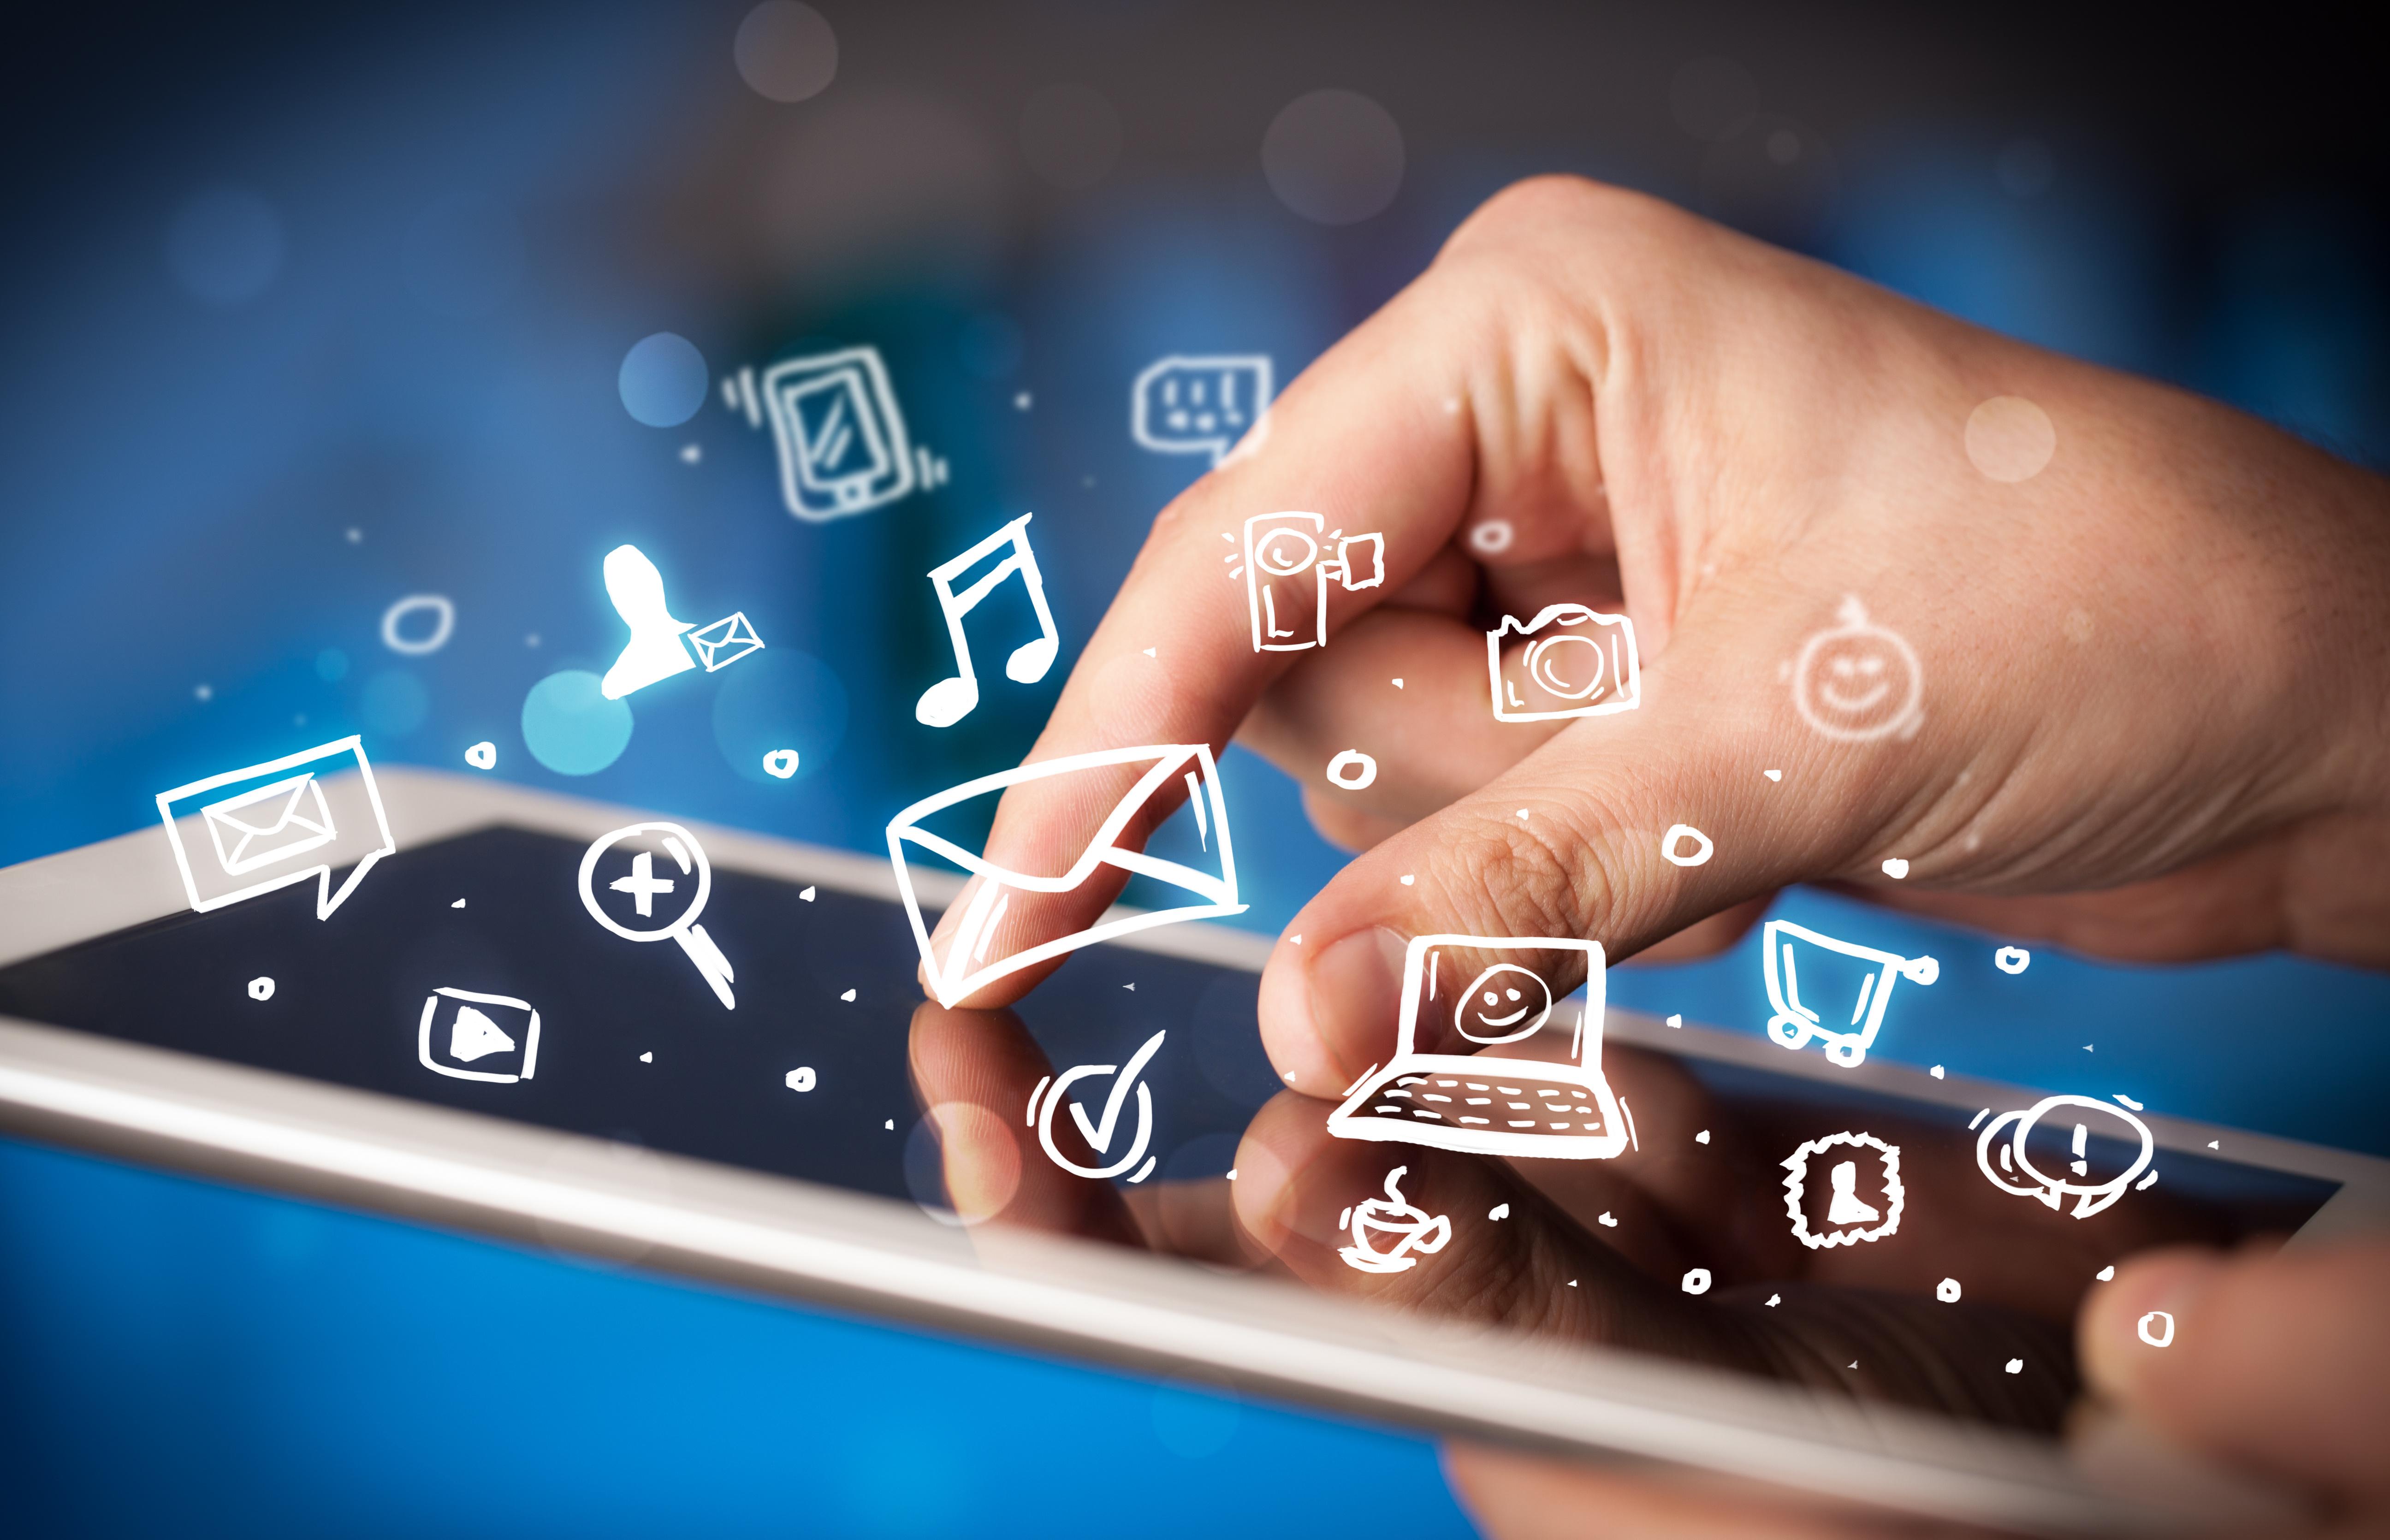 Wallpaper : smartphone, brand, tablet, icons, hand, finger ...